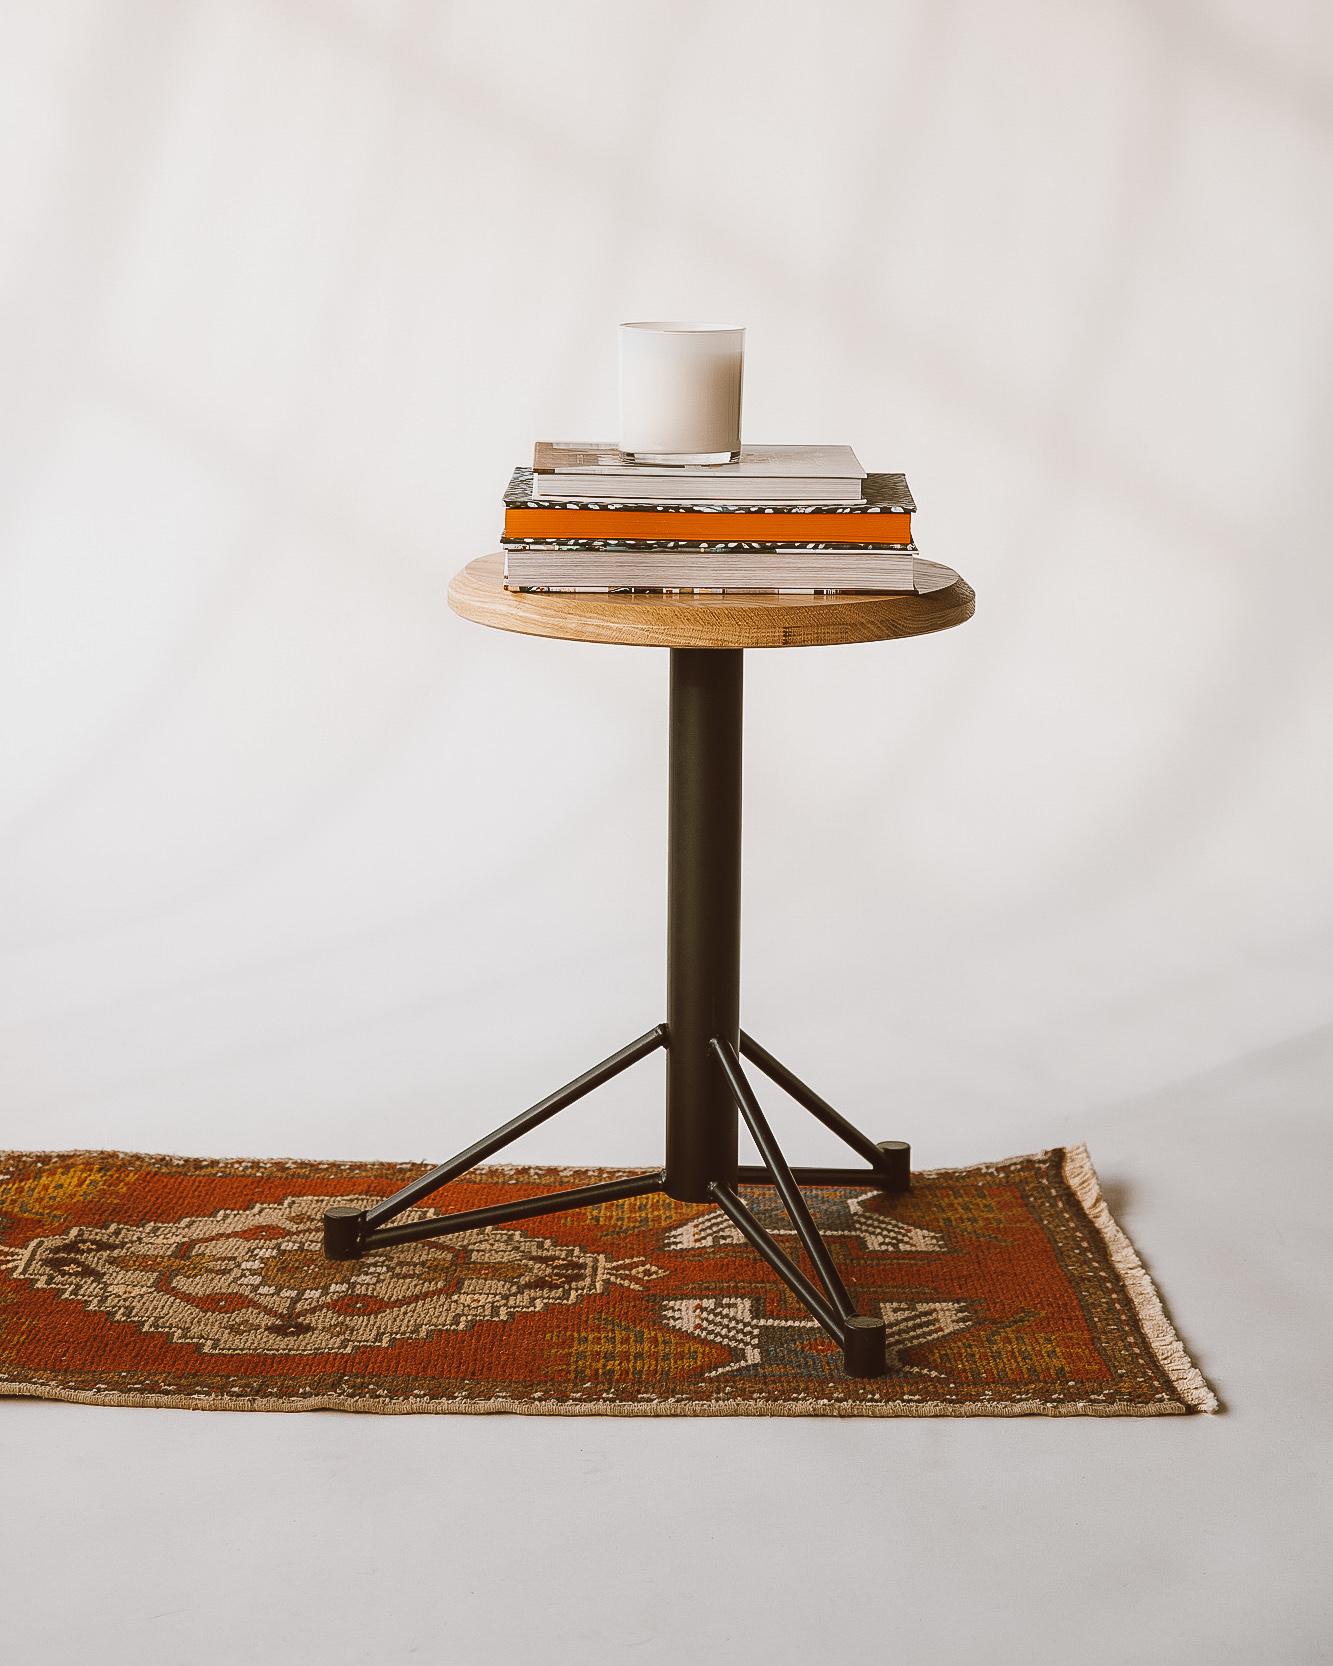 forthehome-edgework-creative-stools02.jpg